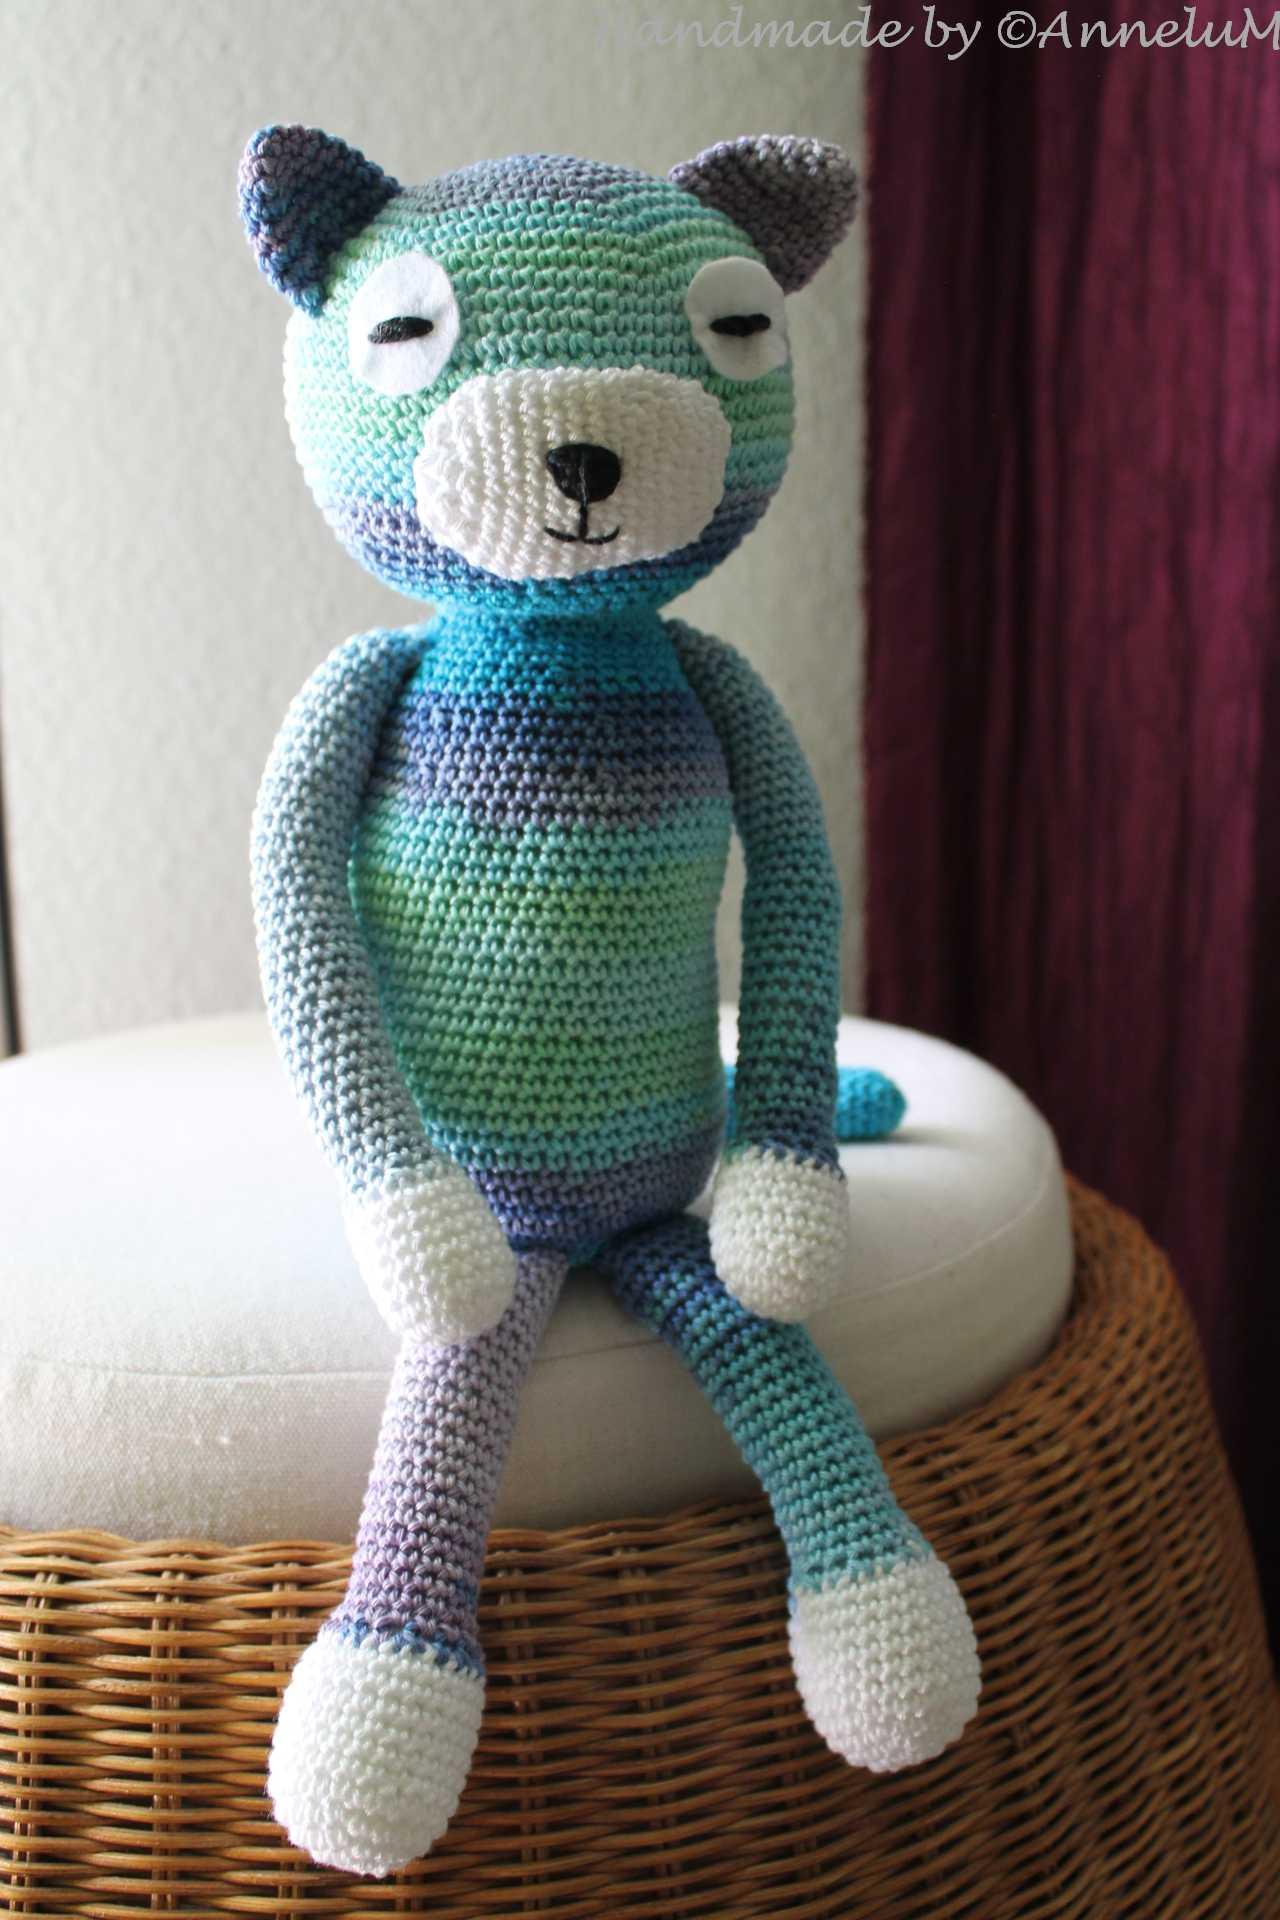 Large Ami Cat crochet pattern - Amigurumi Today | 1920x1280